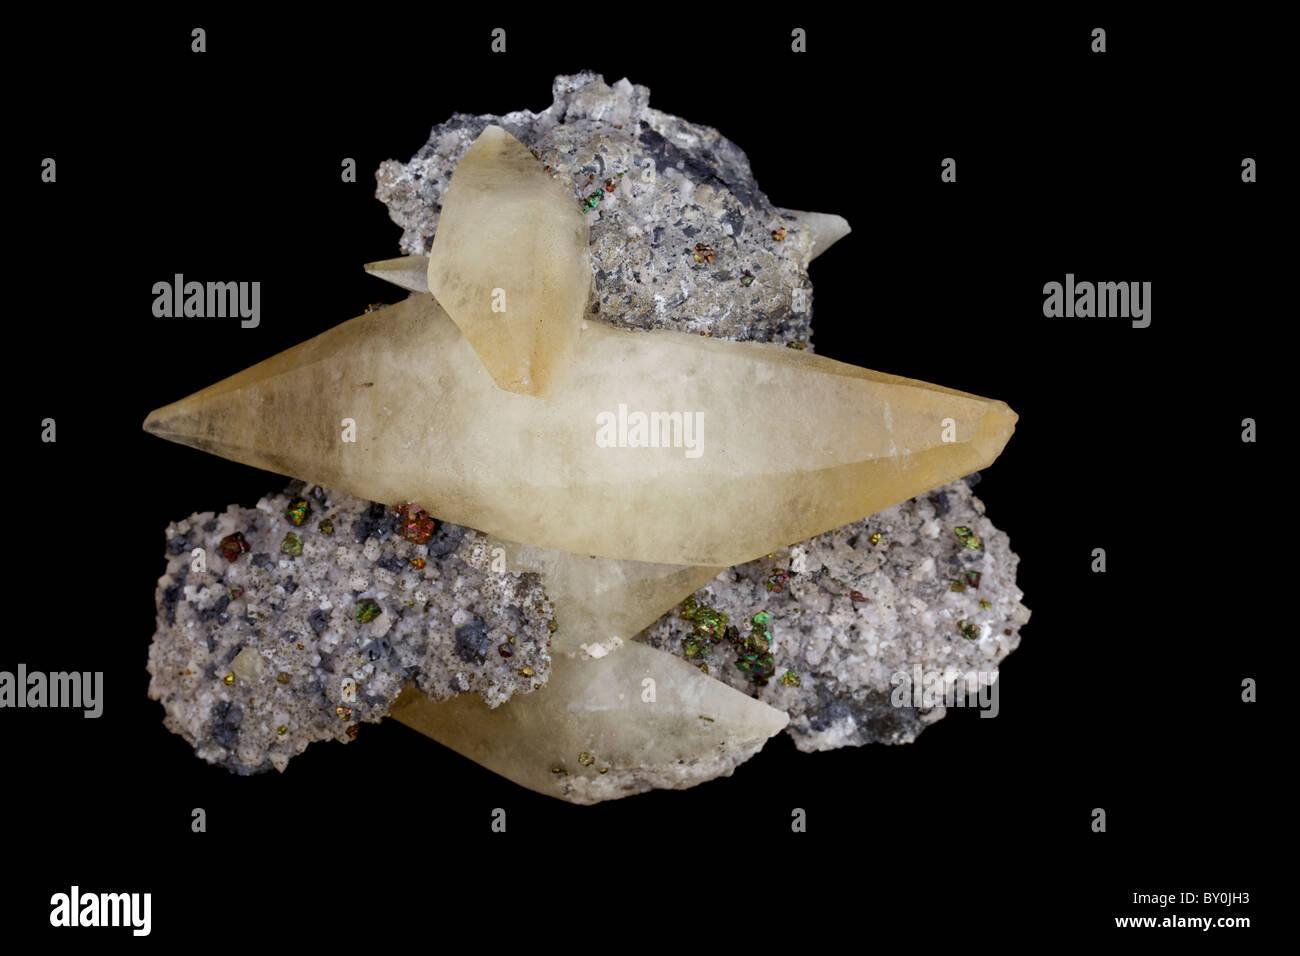 Calcite - Calcium carbonate - Sweetwater Mine - Viburnum Trend - Missouri - USA - One of the most common minerals - Stock Image